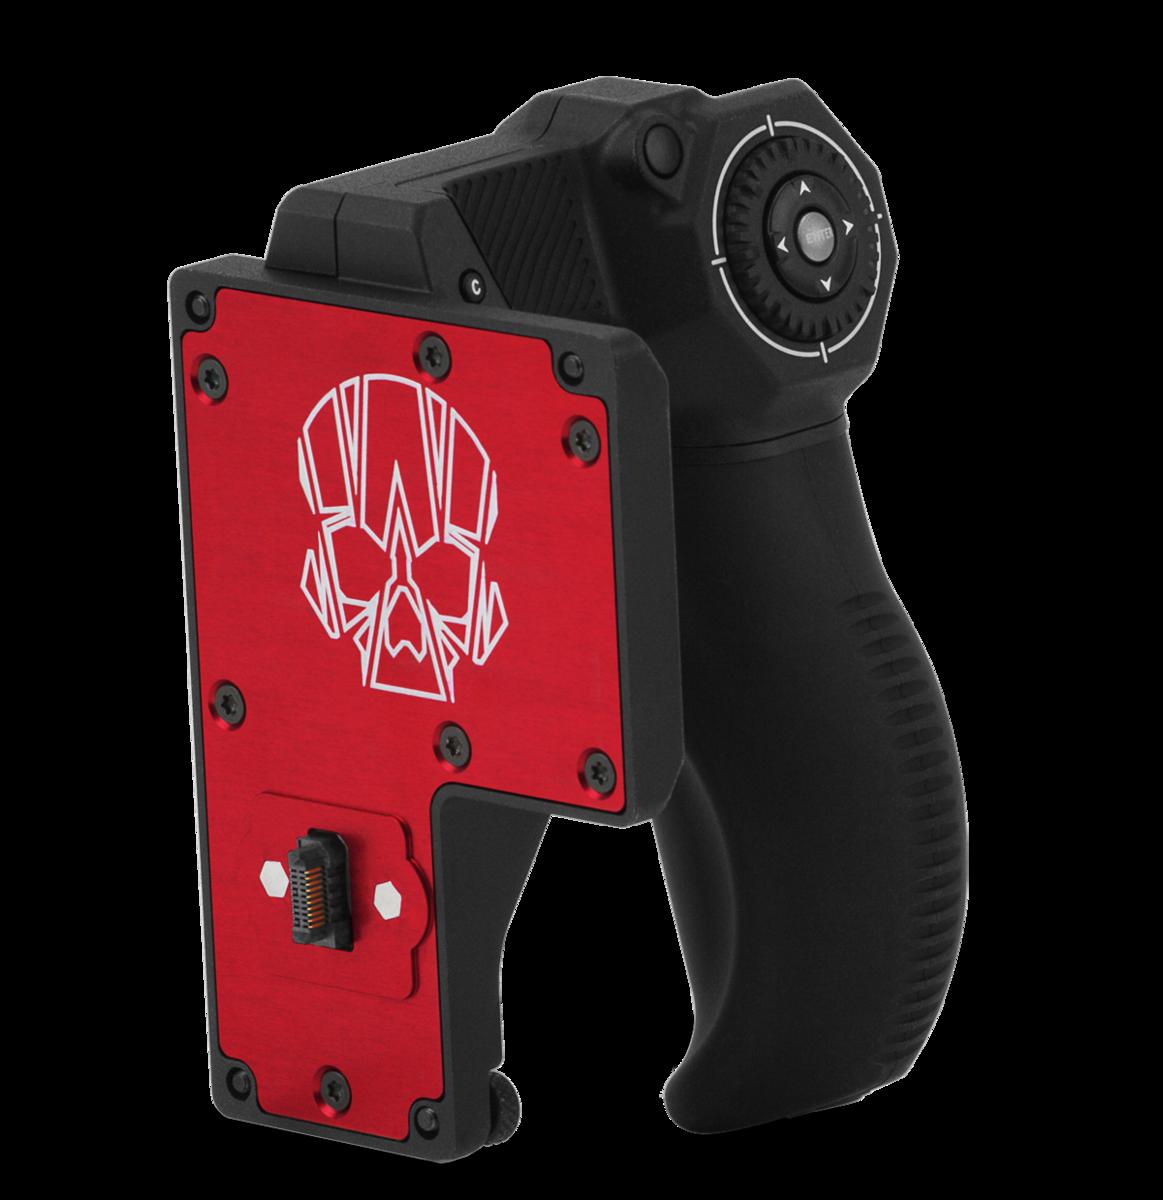 RED DSMC2 Side Handle